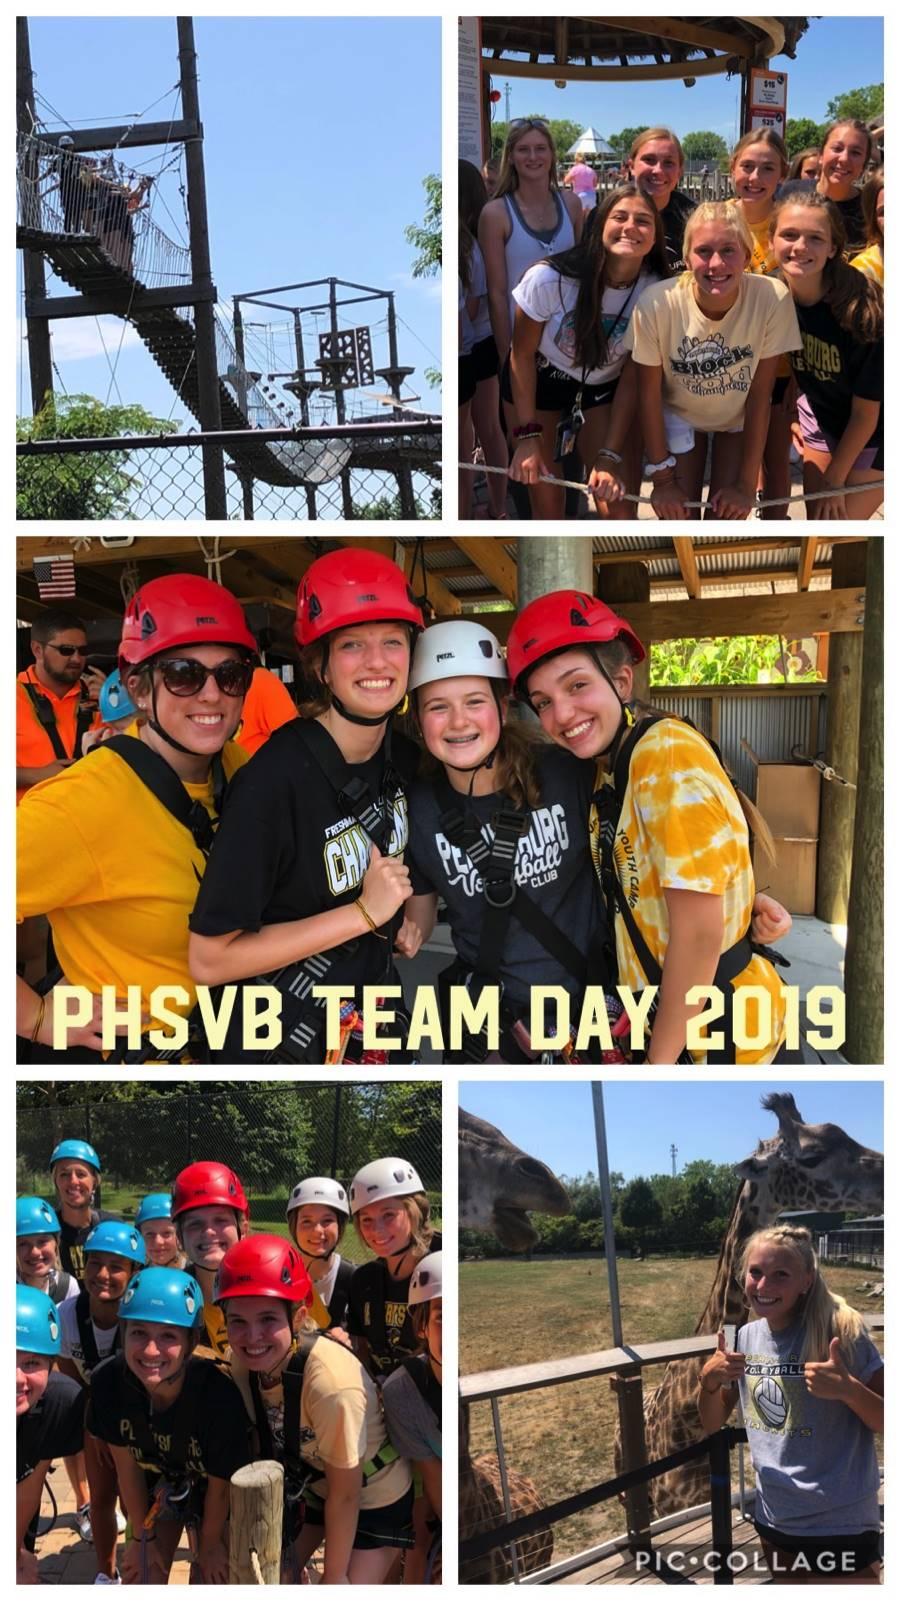 Team Day 2019